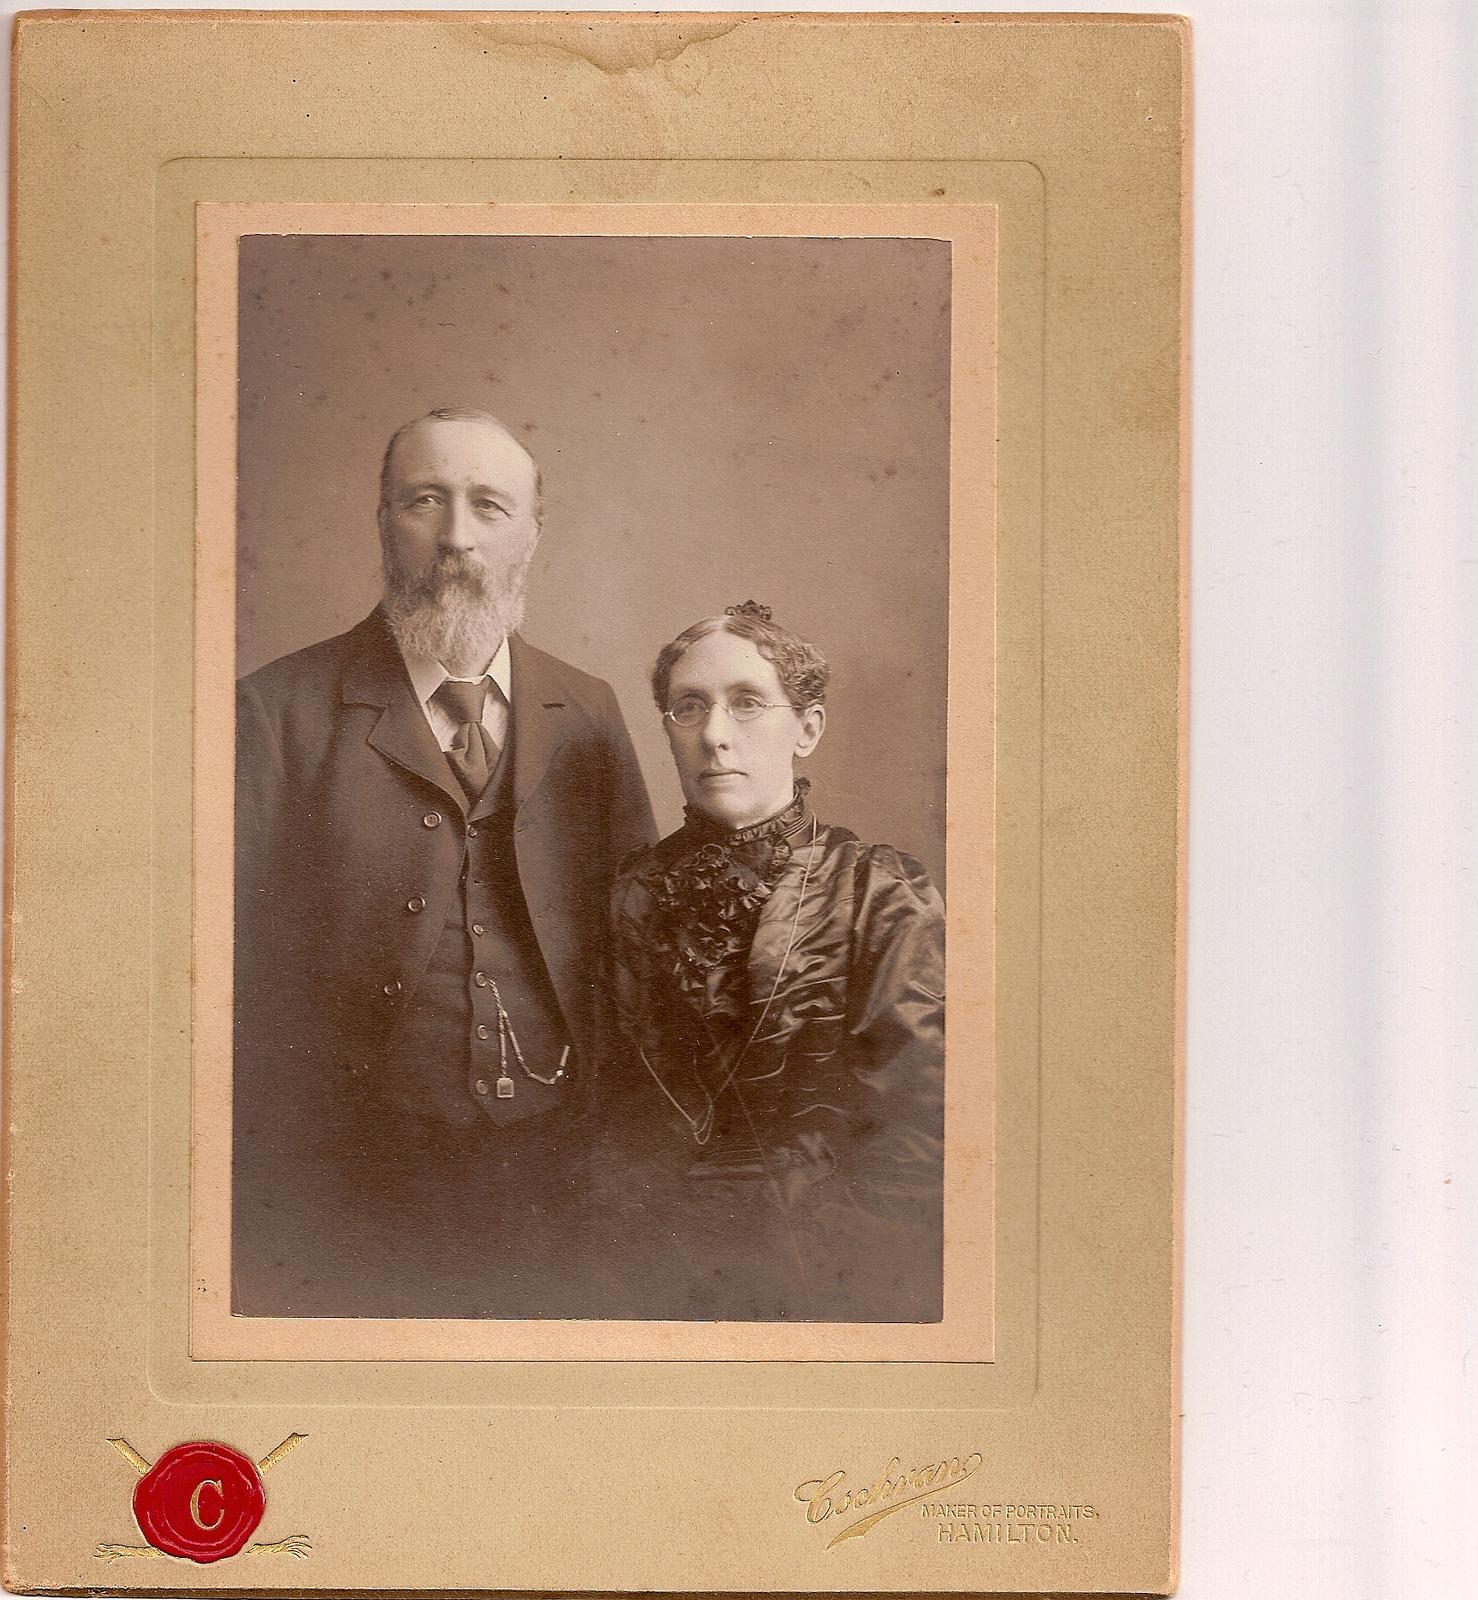 Mr. & Mrs. Addison Hager